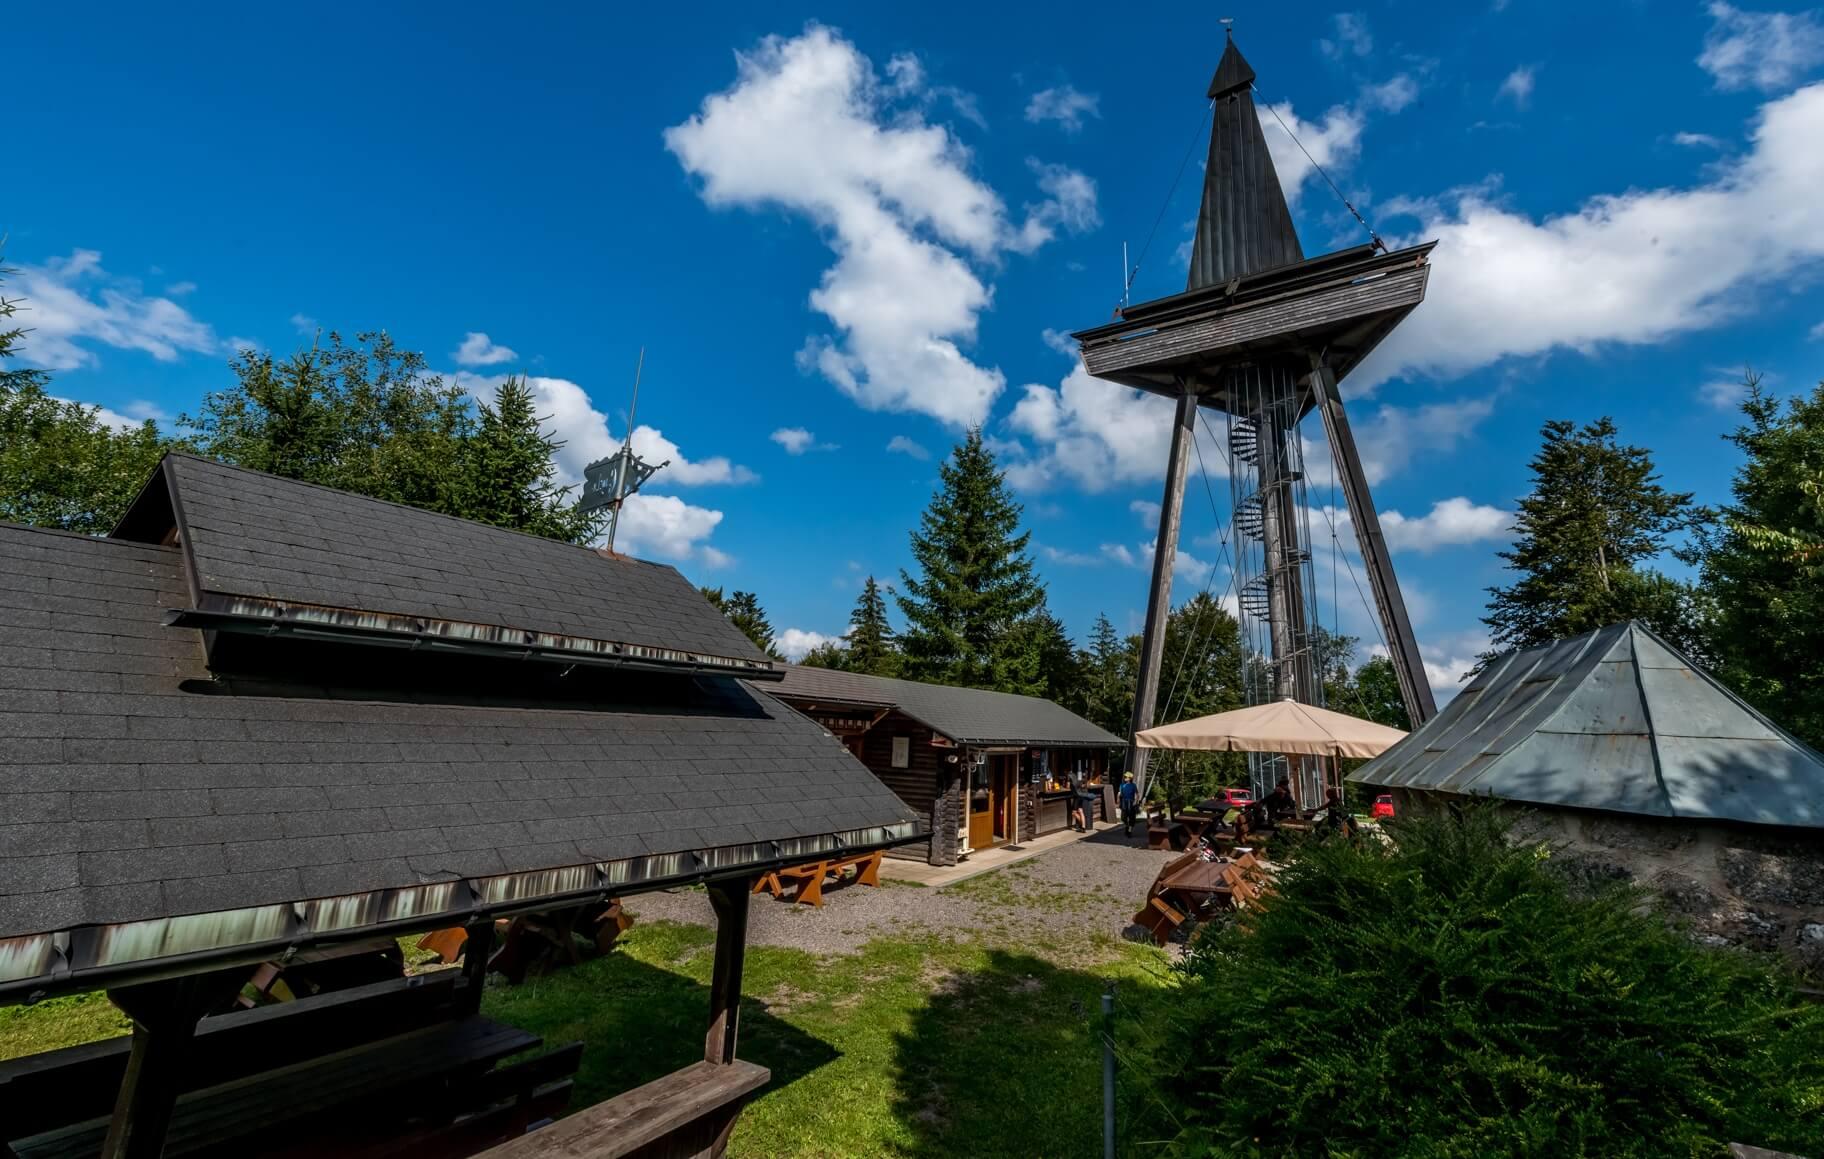 Gugelturm, Herrischried, Aussichtspunkt, Aussichtsplattform, Turm, Ferienwelt, Südschwarzwald, Schwarzwald, Wandern, Wandertour